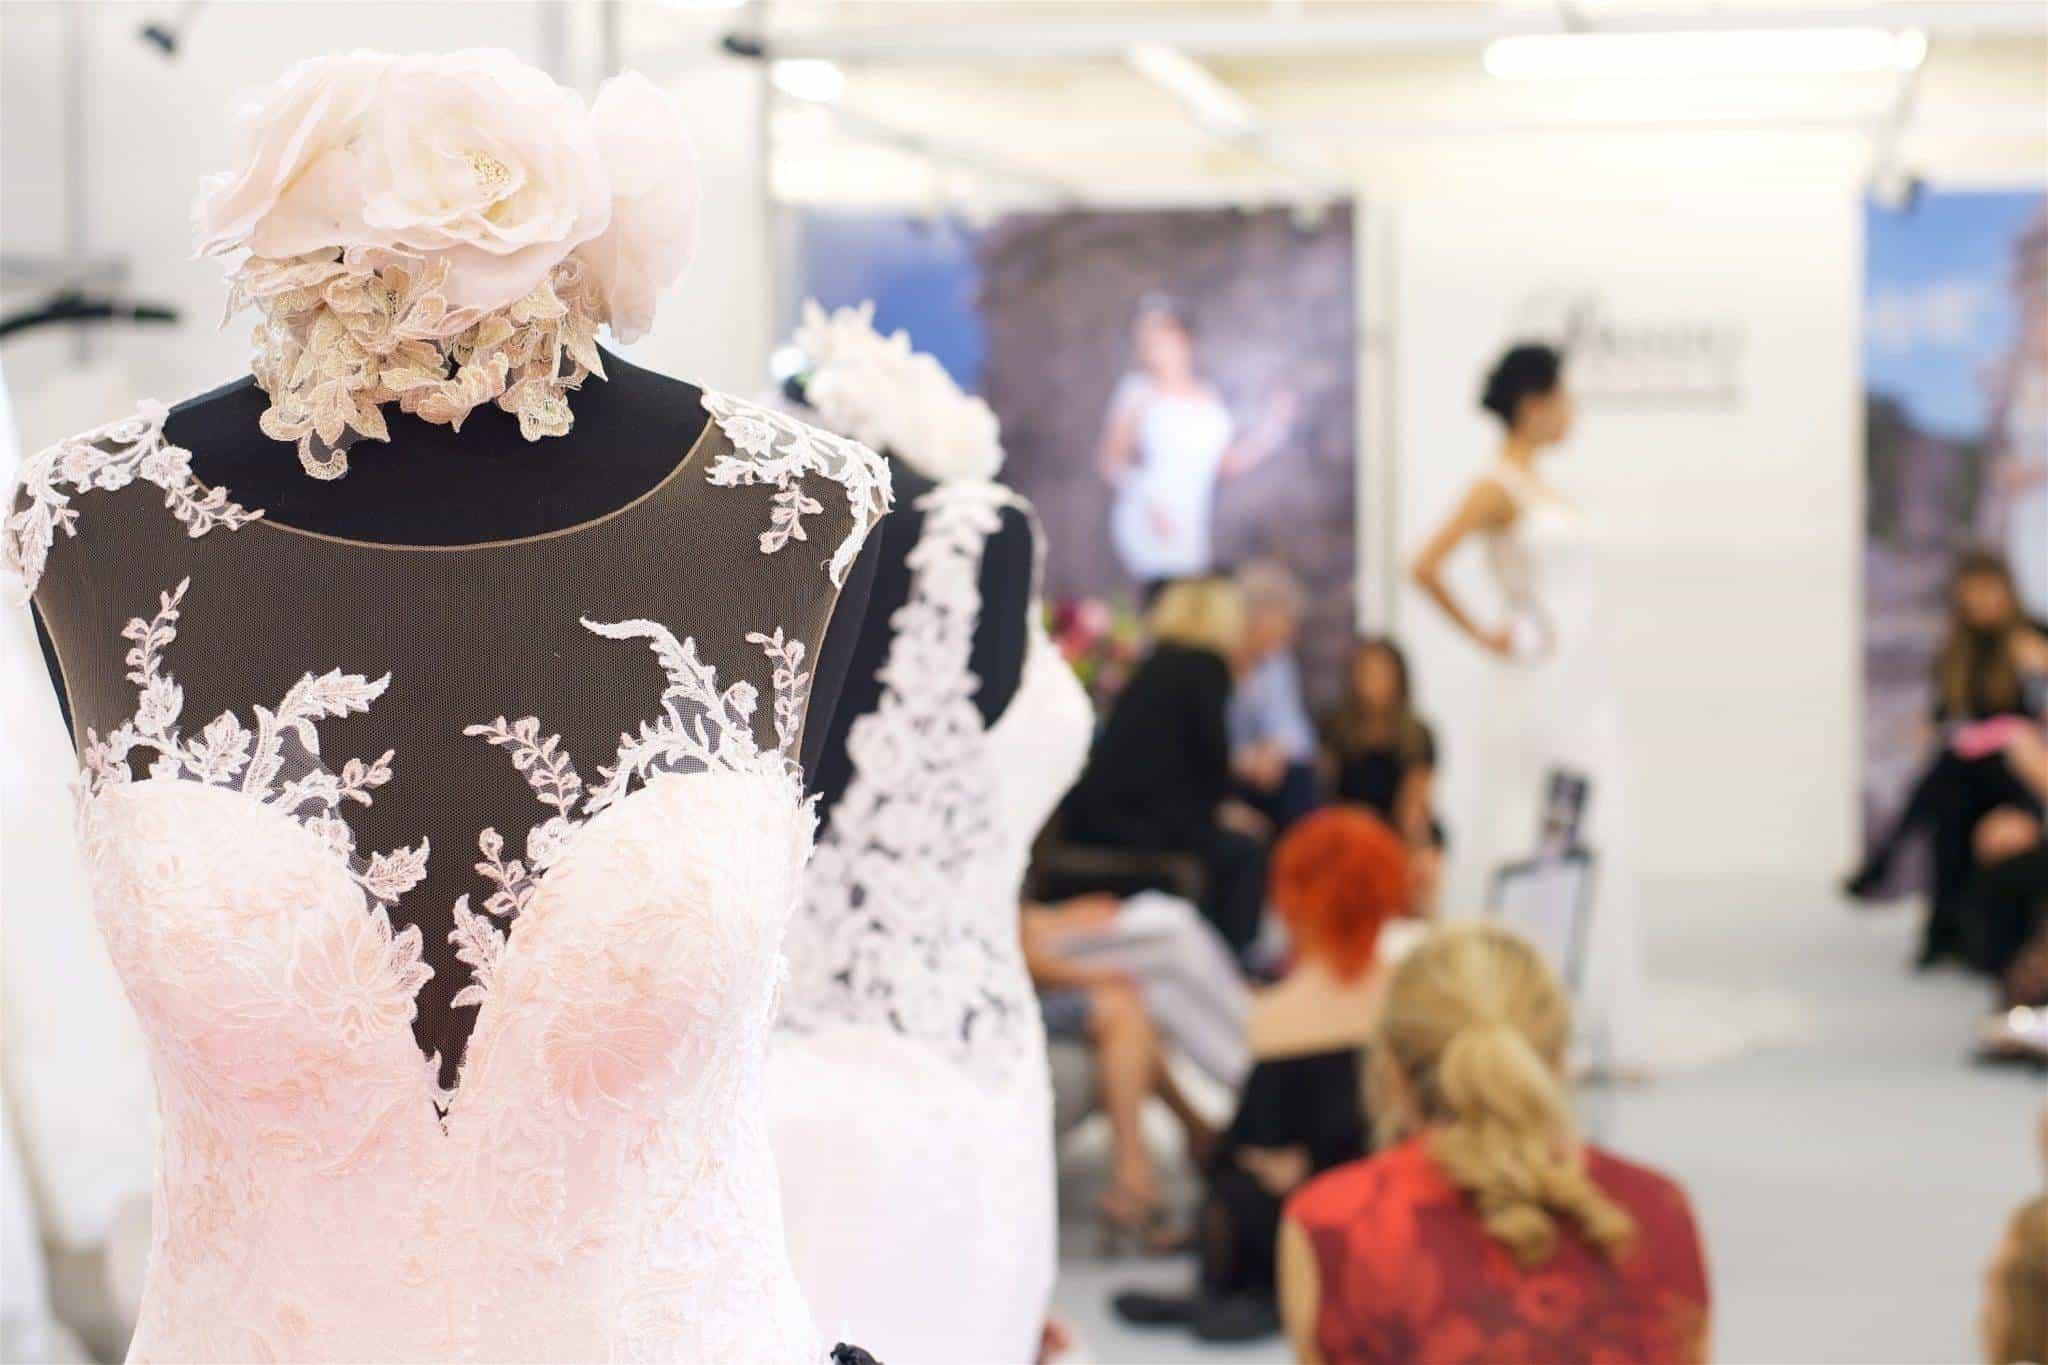 Future Trends at Harrogate Bridal Show 2017